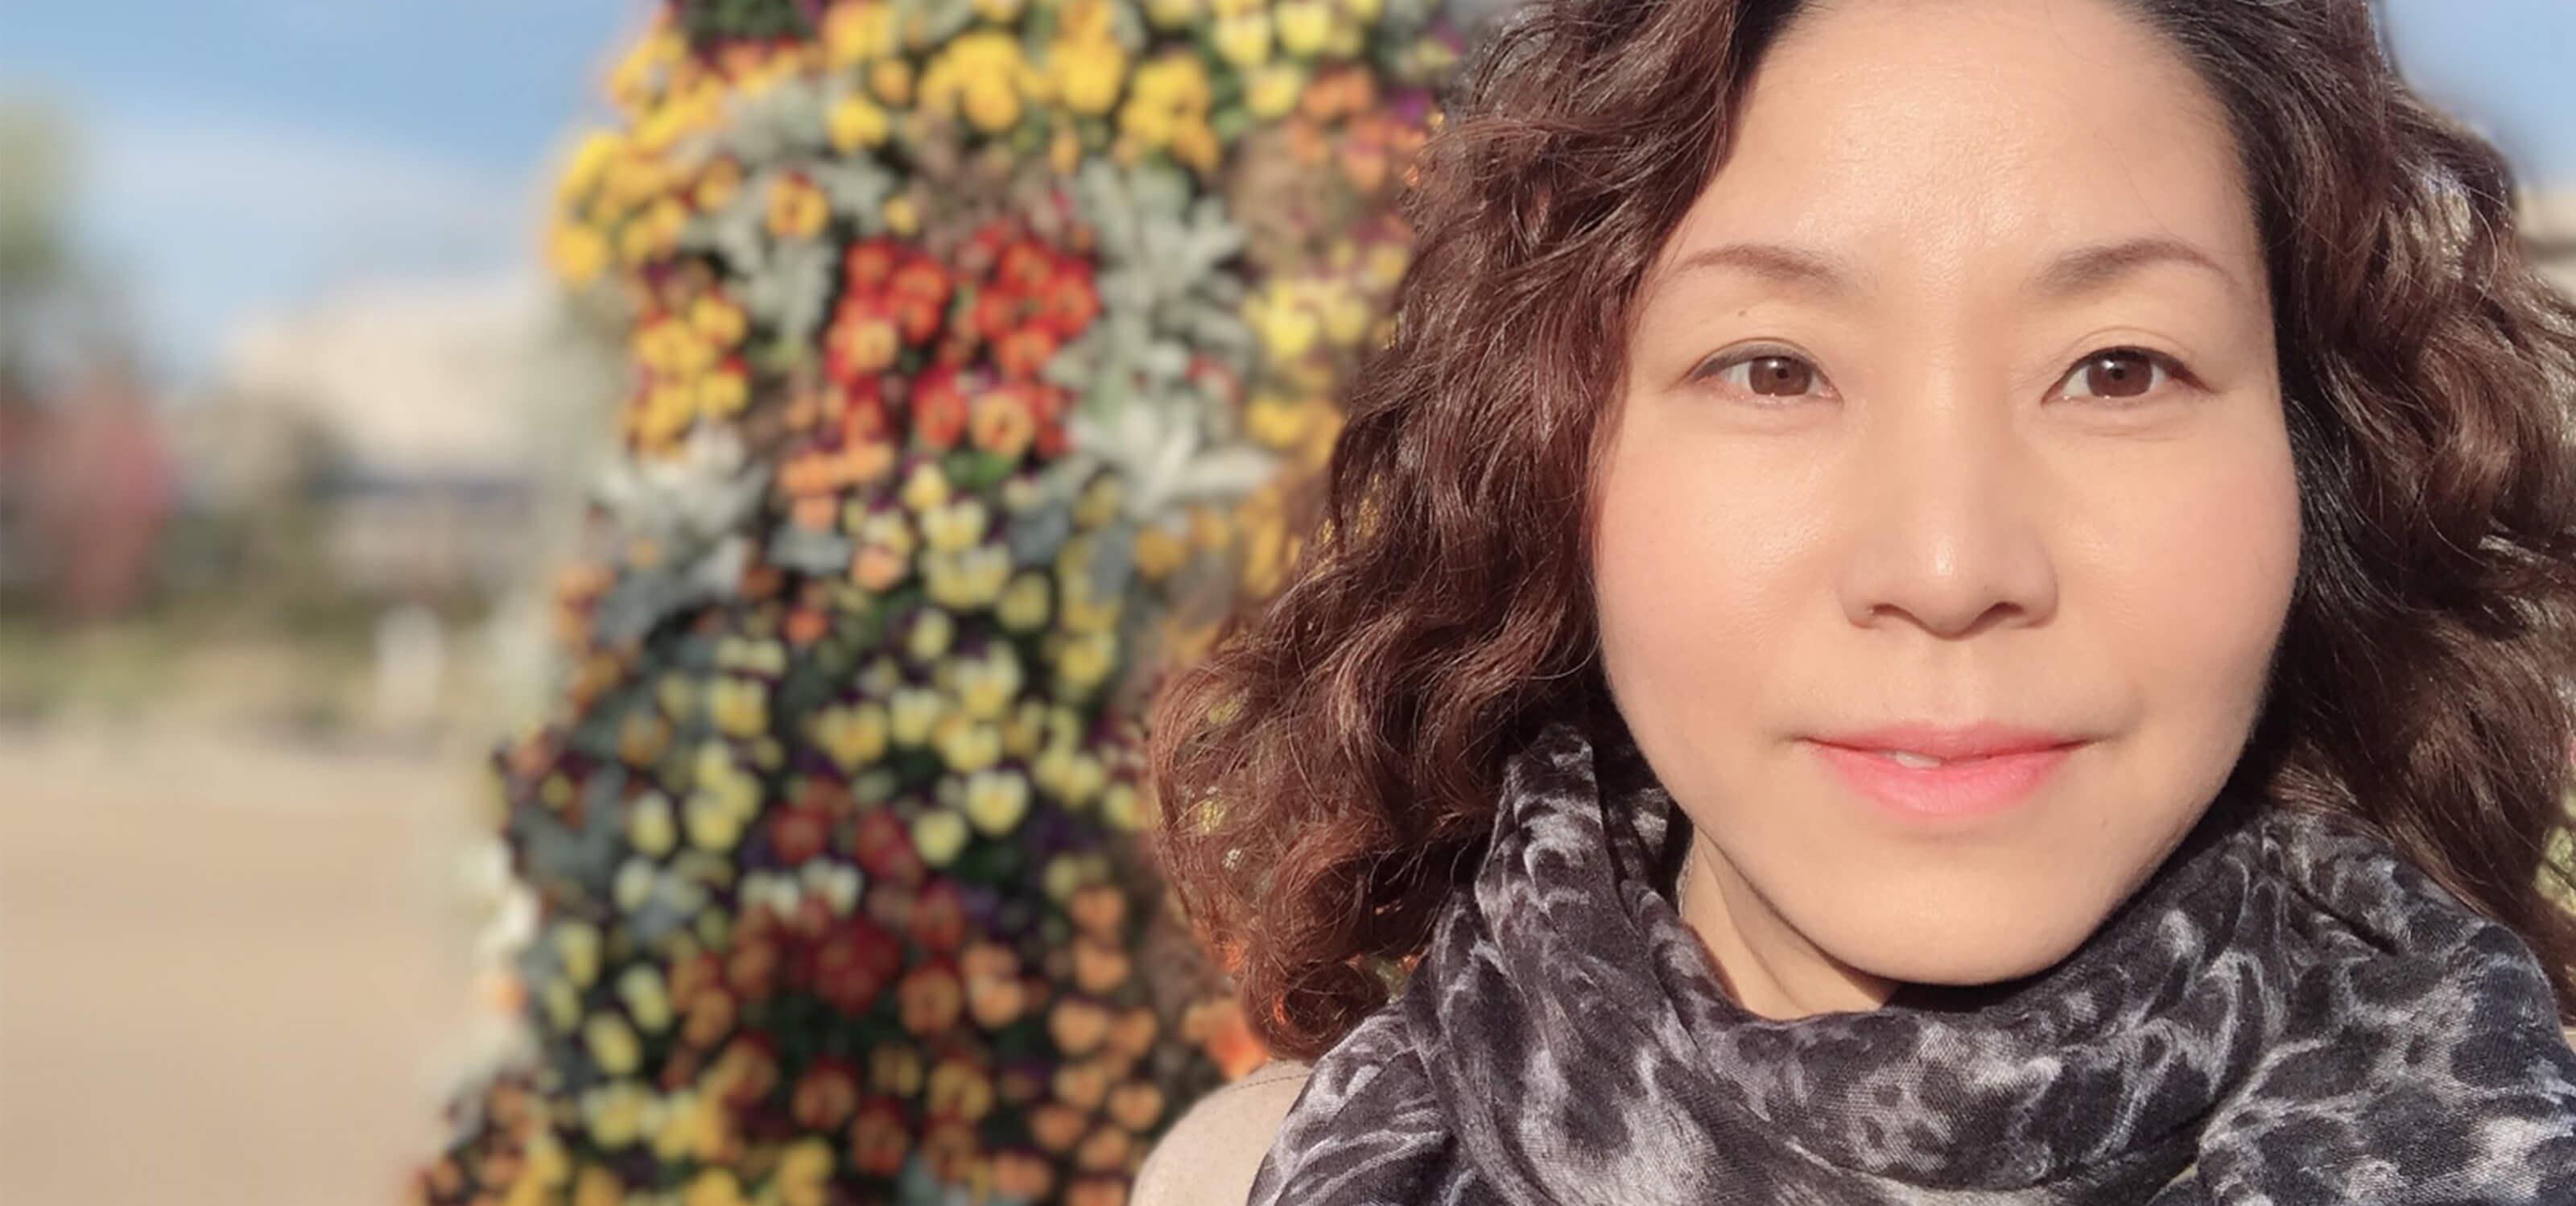 DigiPen graduate and former Nintendo character designer Satomi Asakawa.